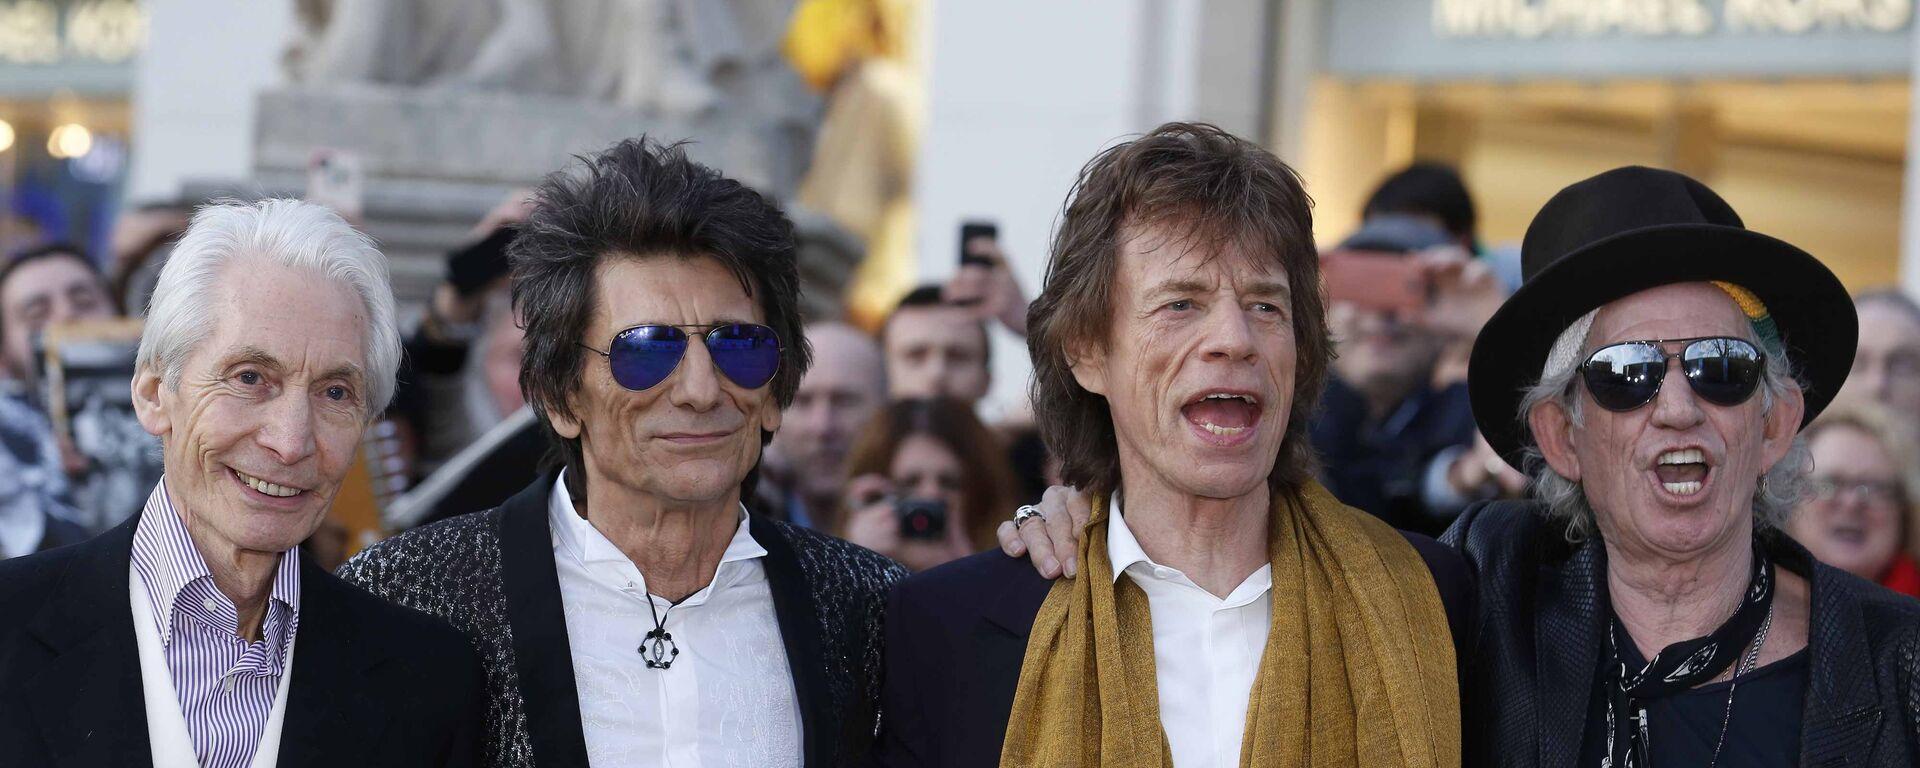 Skupina The Rolling Stones: Charlie Watts, Ronnie Wood, Mick Jagger and Keith Richards - Sputnik Česká republika, 1920, 24.08.2021